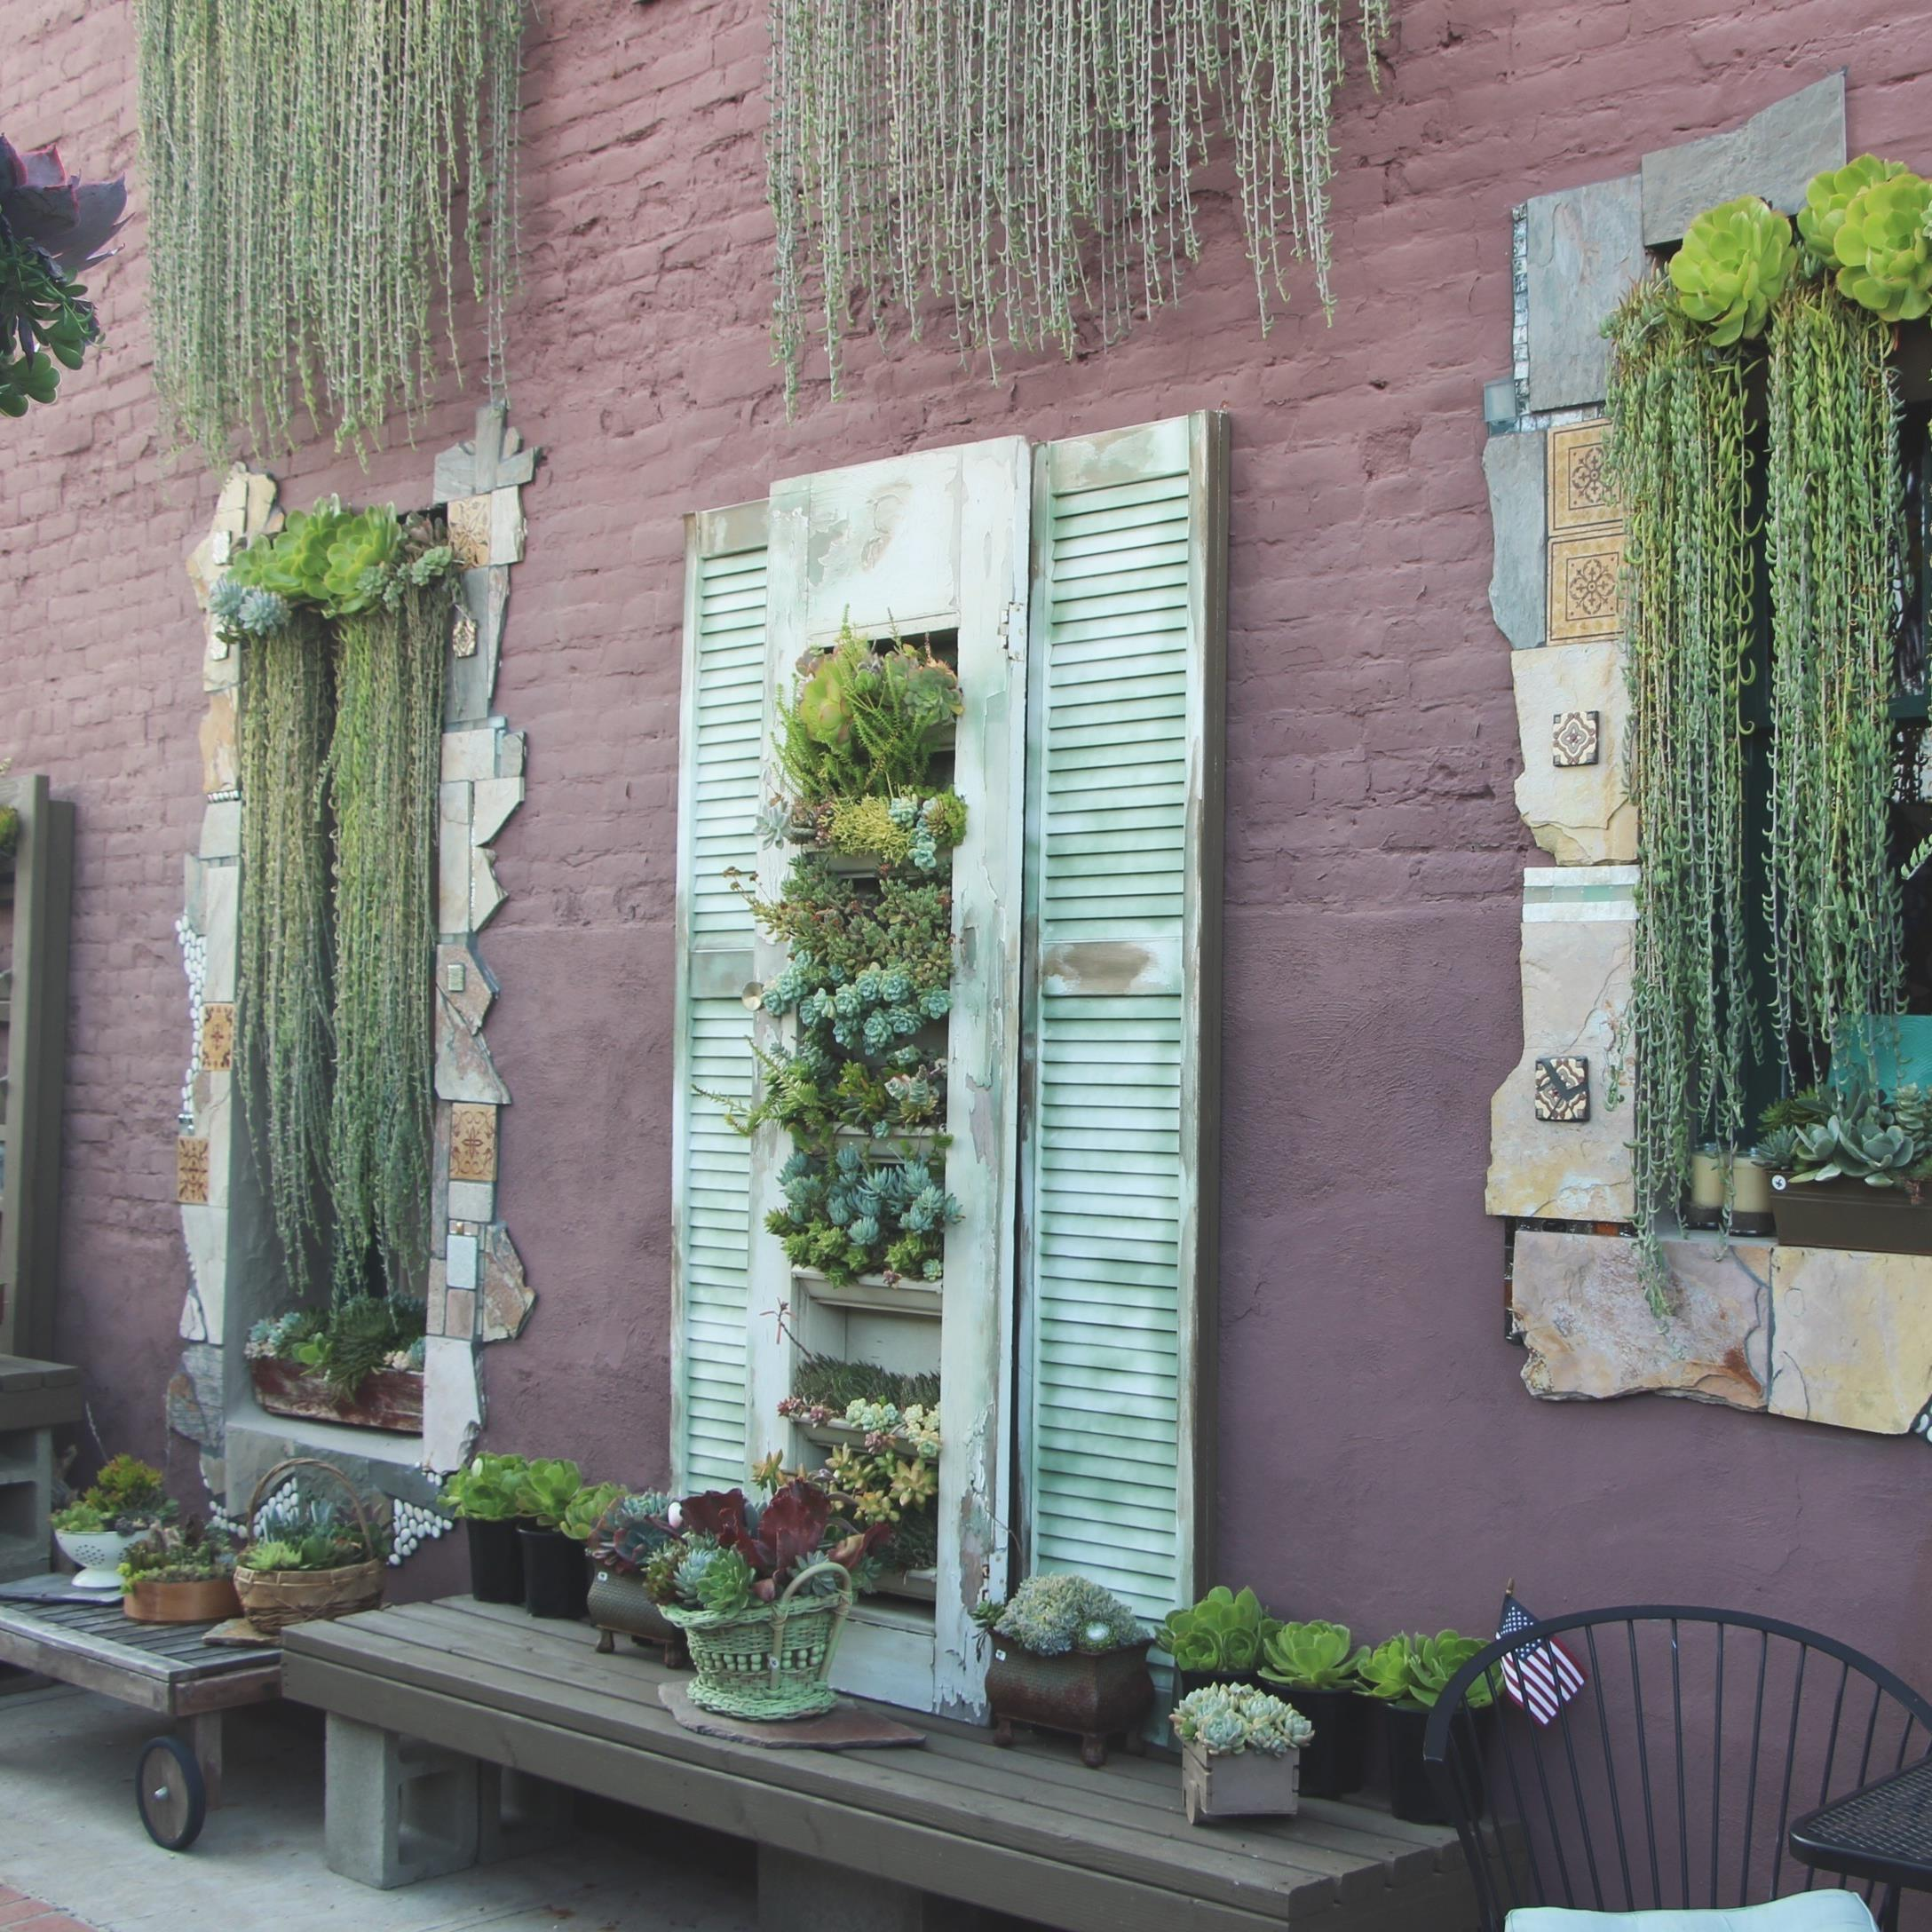 Succulent Cafe Oceanside: A Living Masterpiece